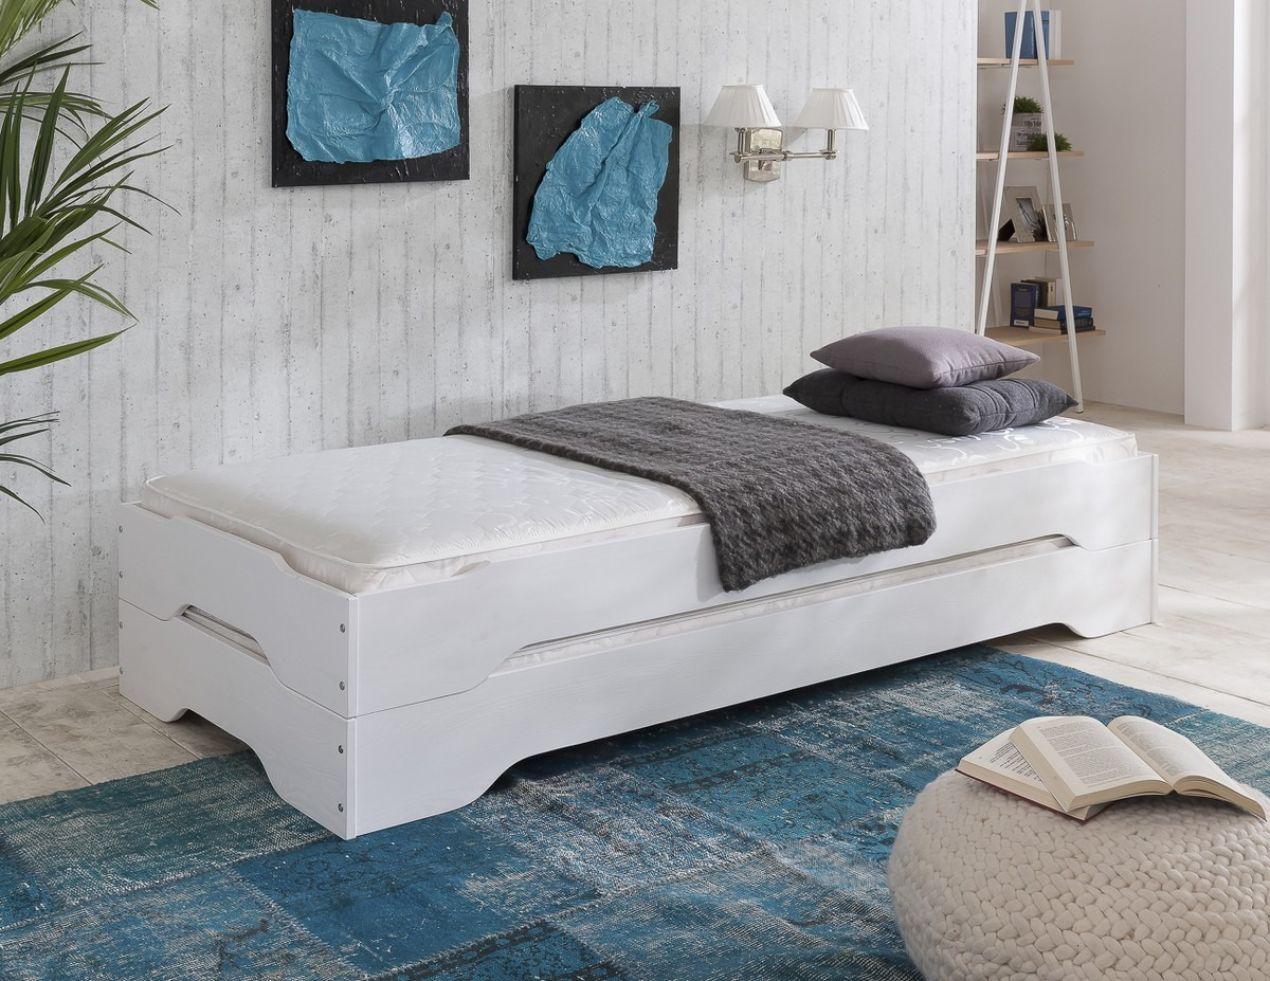 ester 7 zonen taschenfederkern matratze 90x200 h he 17 5 cm in h3 ebay. Black Bedroom Furniture Sets. Home Design Ideas